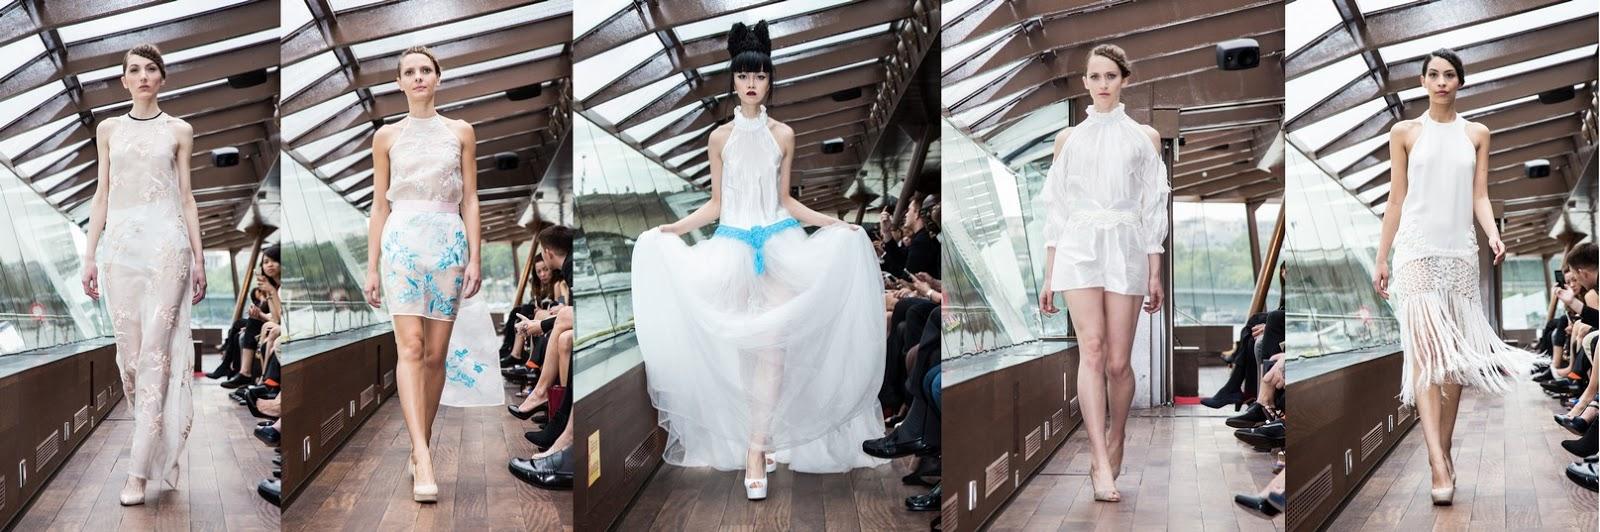 WTFSG-j-summer-fashion-show-on-river-seine-paris-2